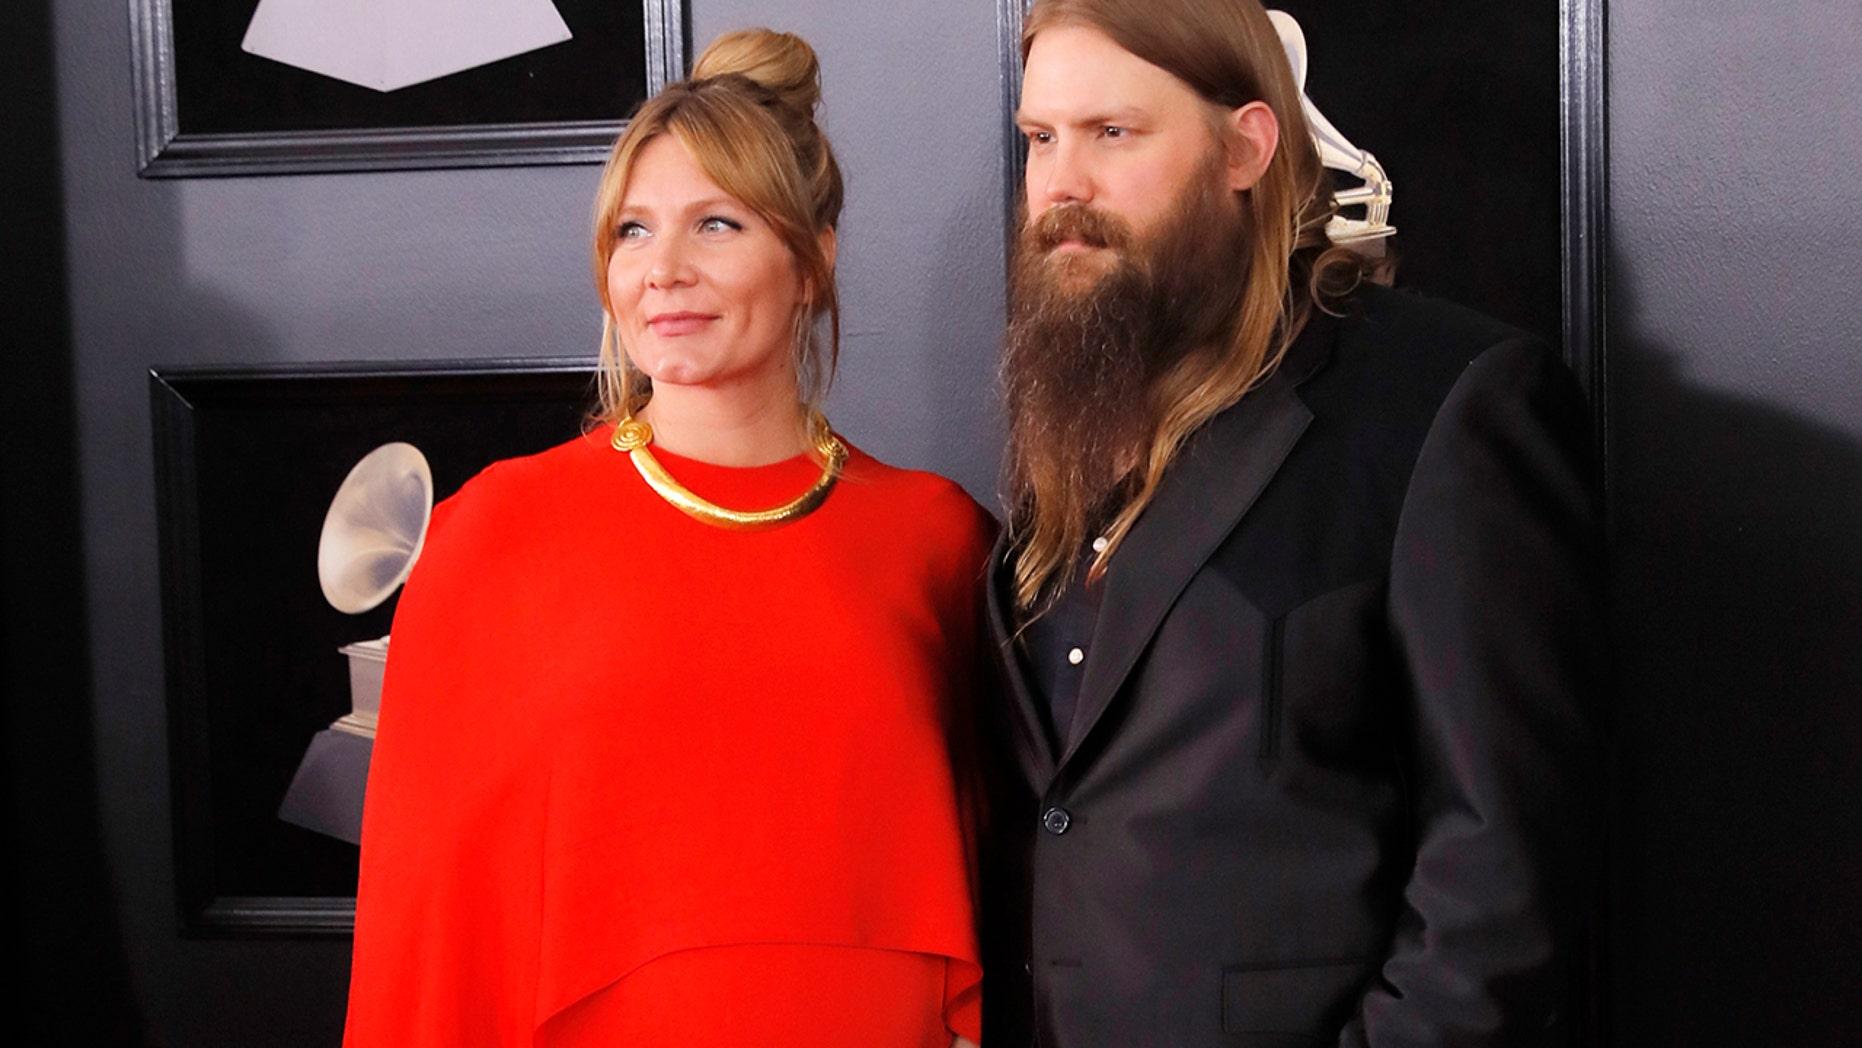 Chris Stapleton and Morgane Stapleton at the 60th Annual Grammy Awards.